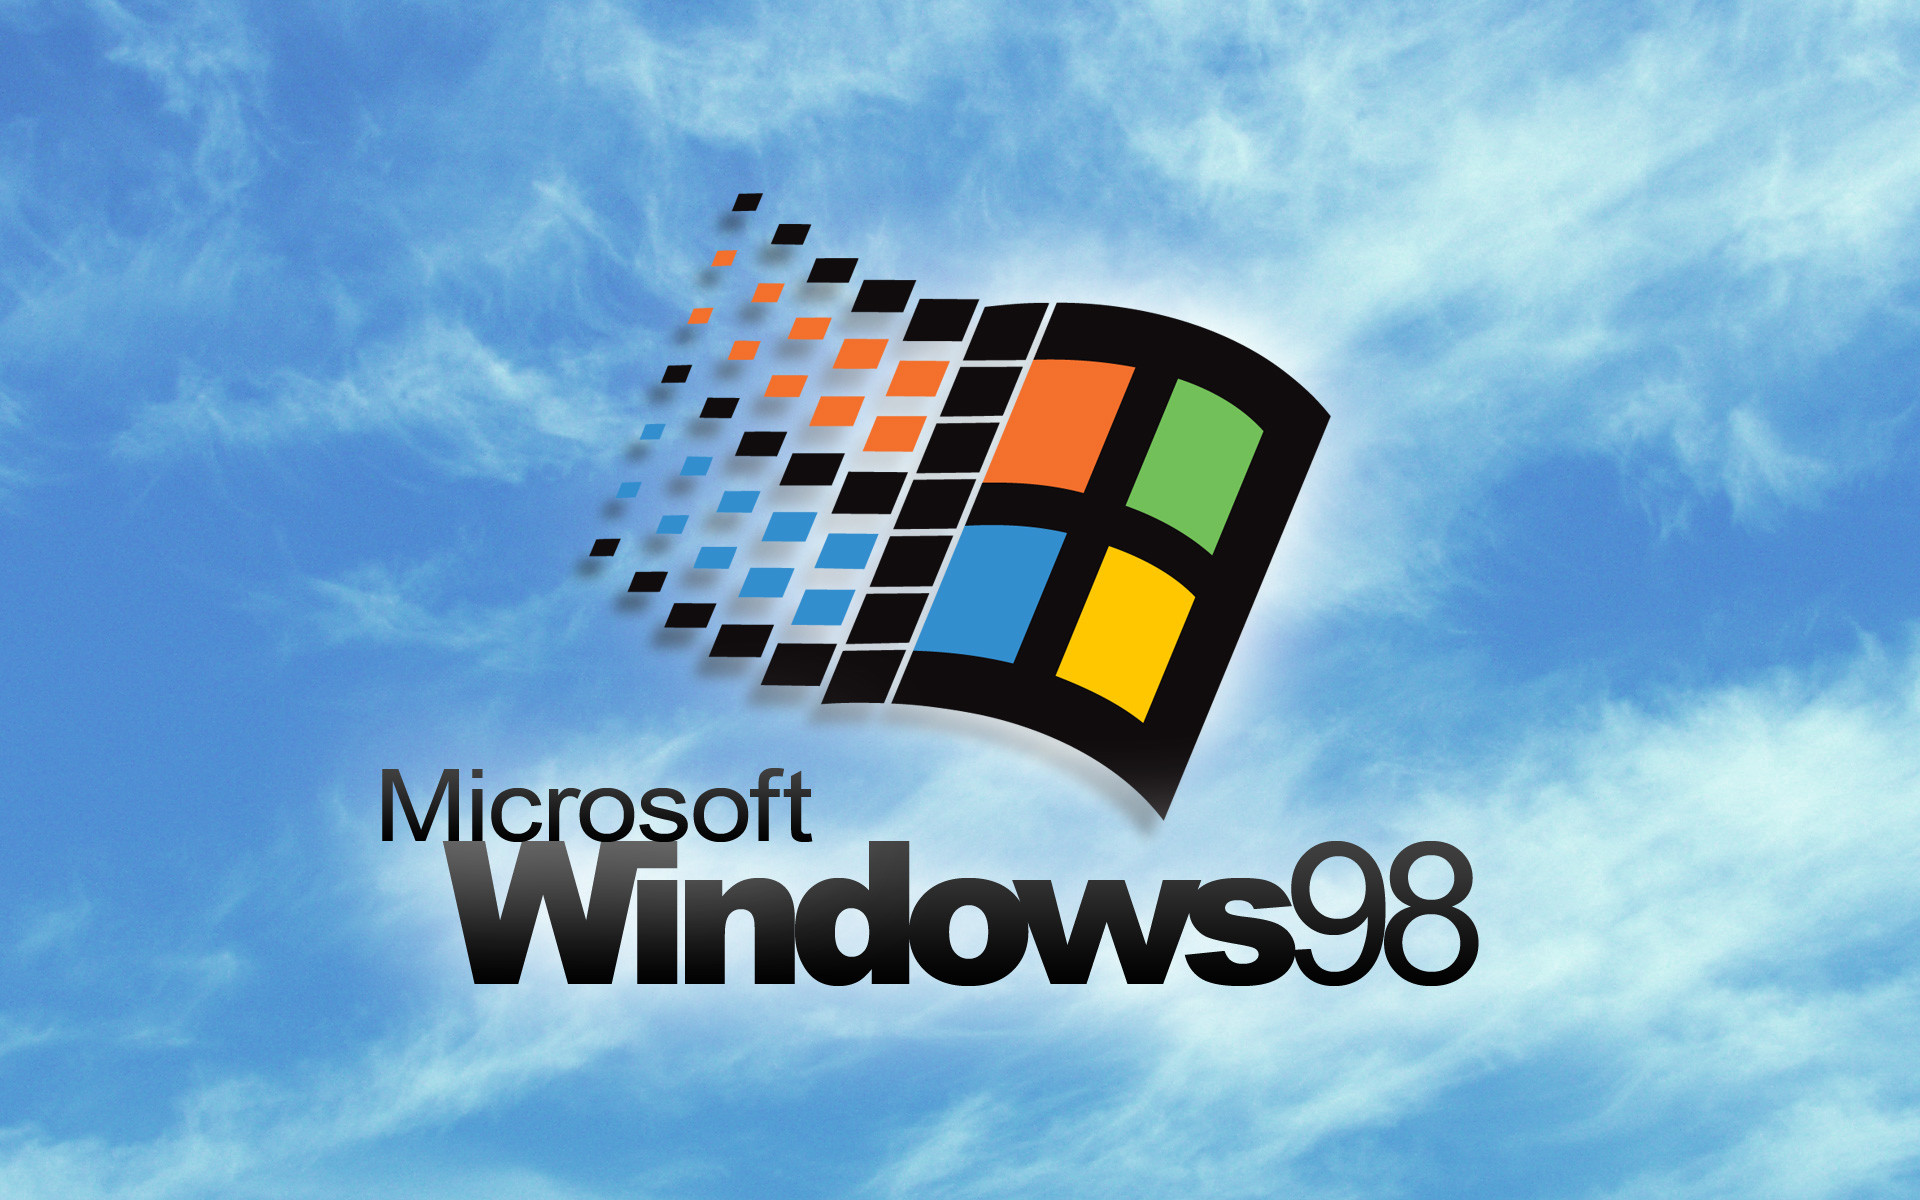 Windows 95 Wallpaper 67 Images